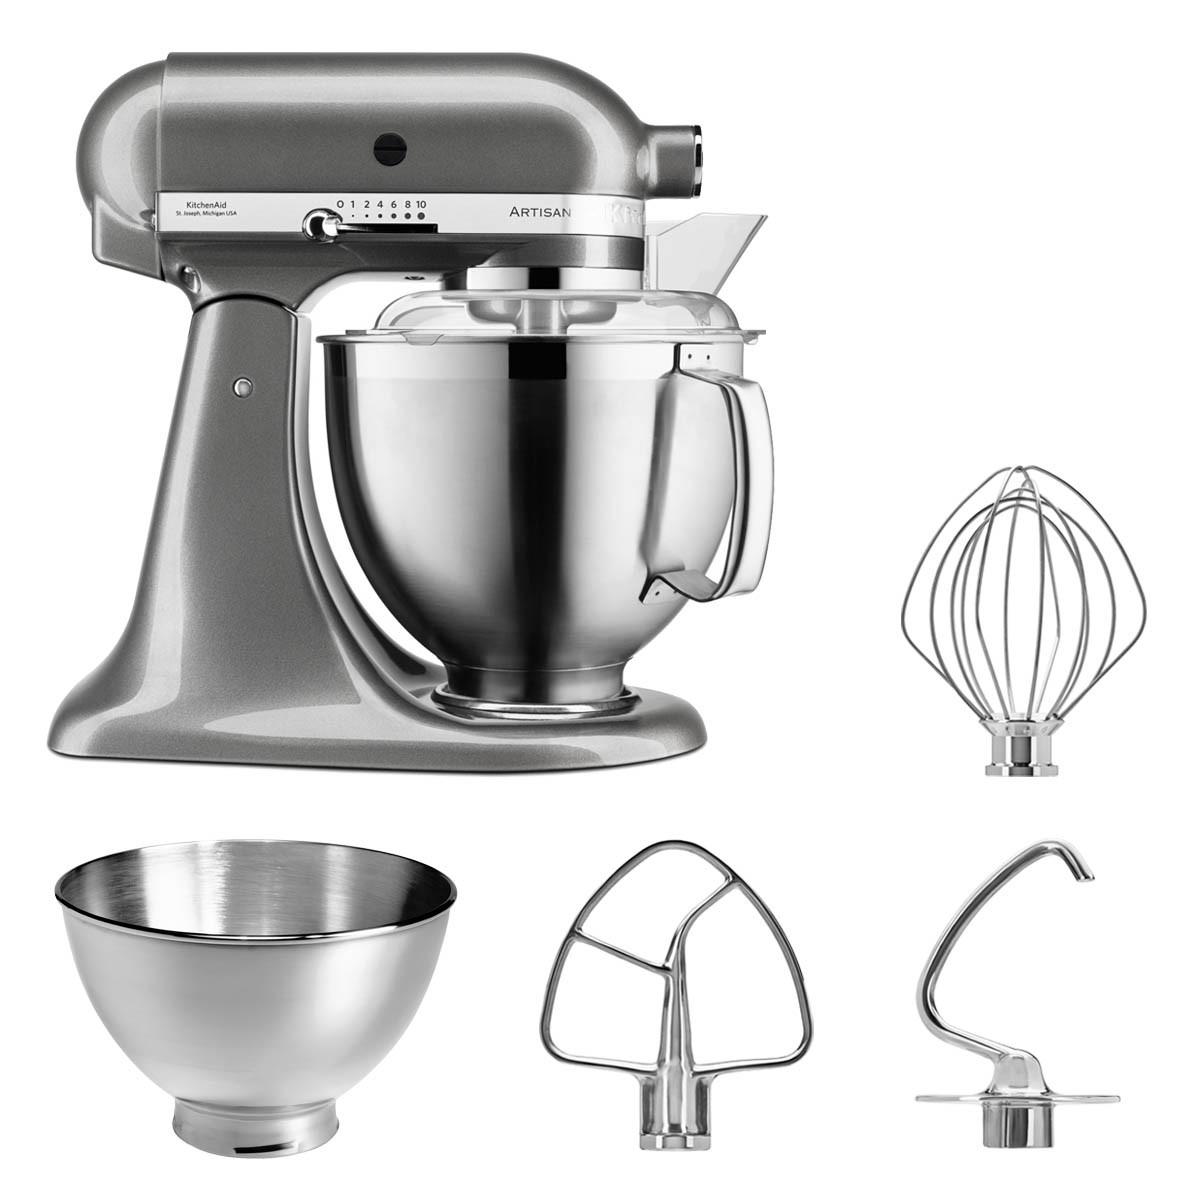 KitchenAid Küchenmaschine 5KSM185PS medallionsilber